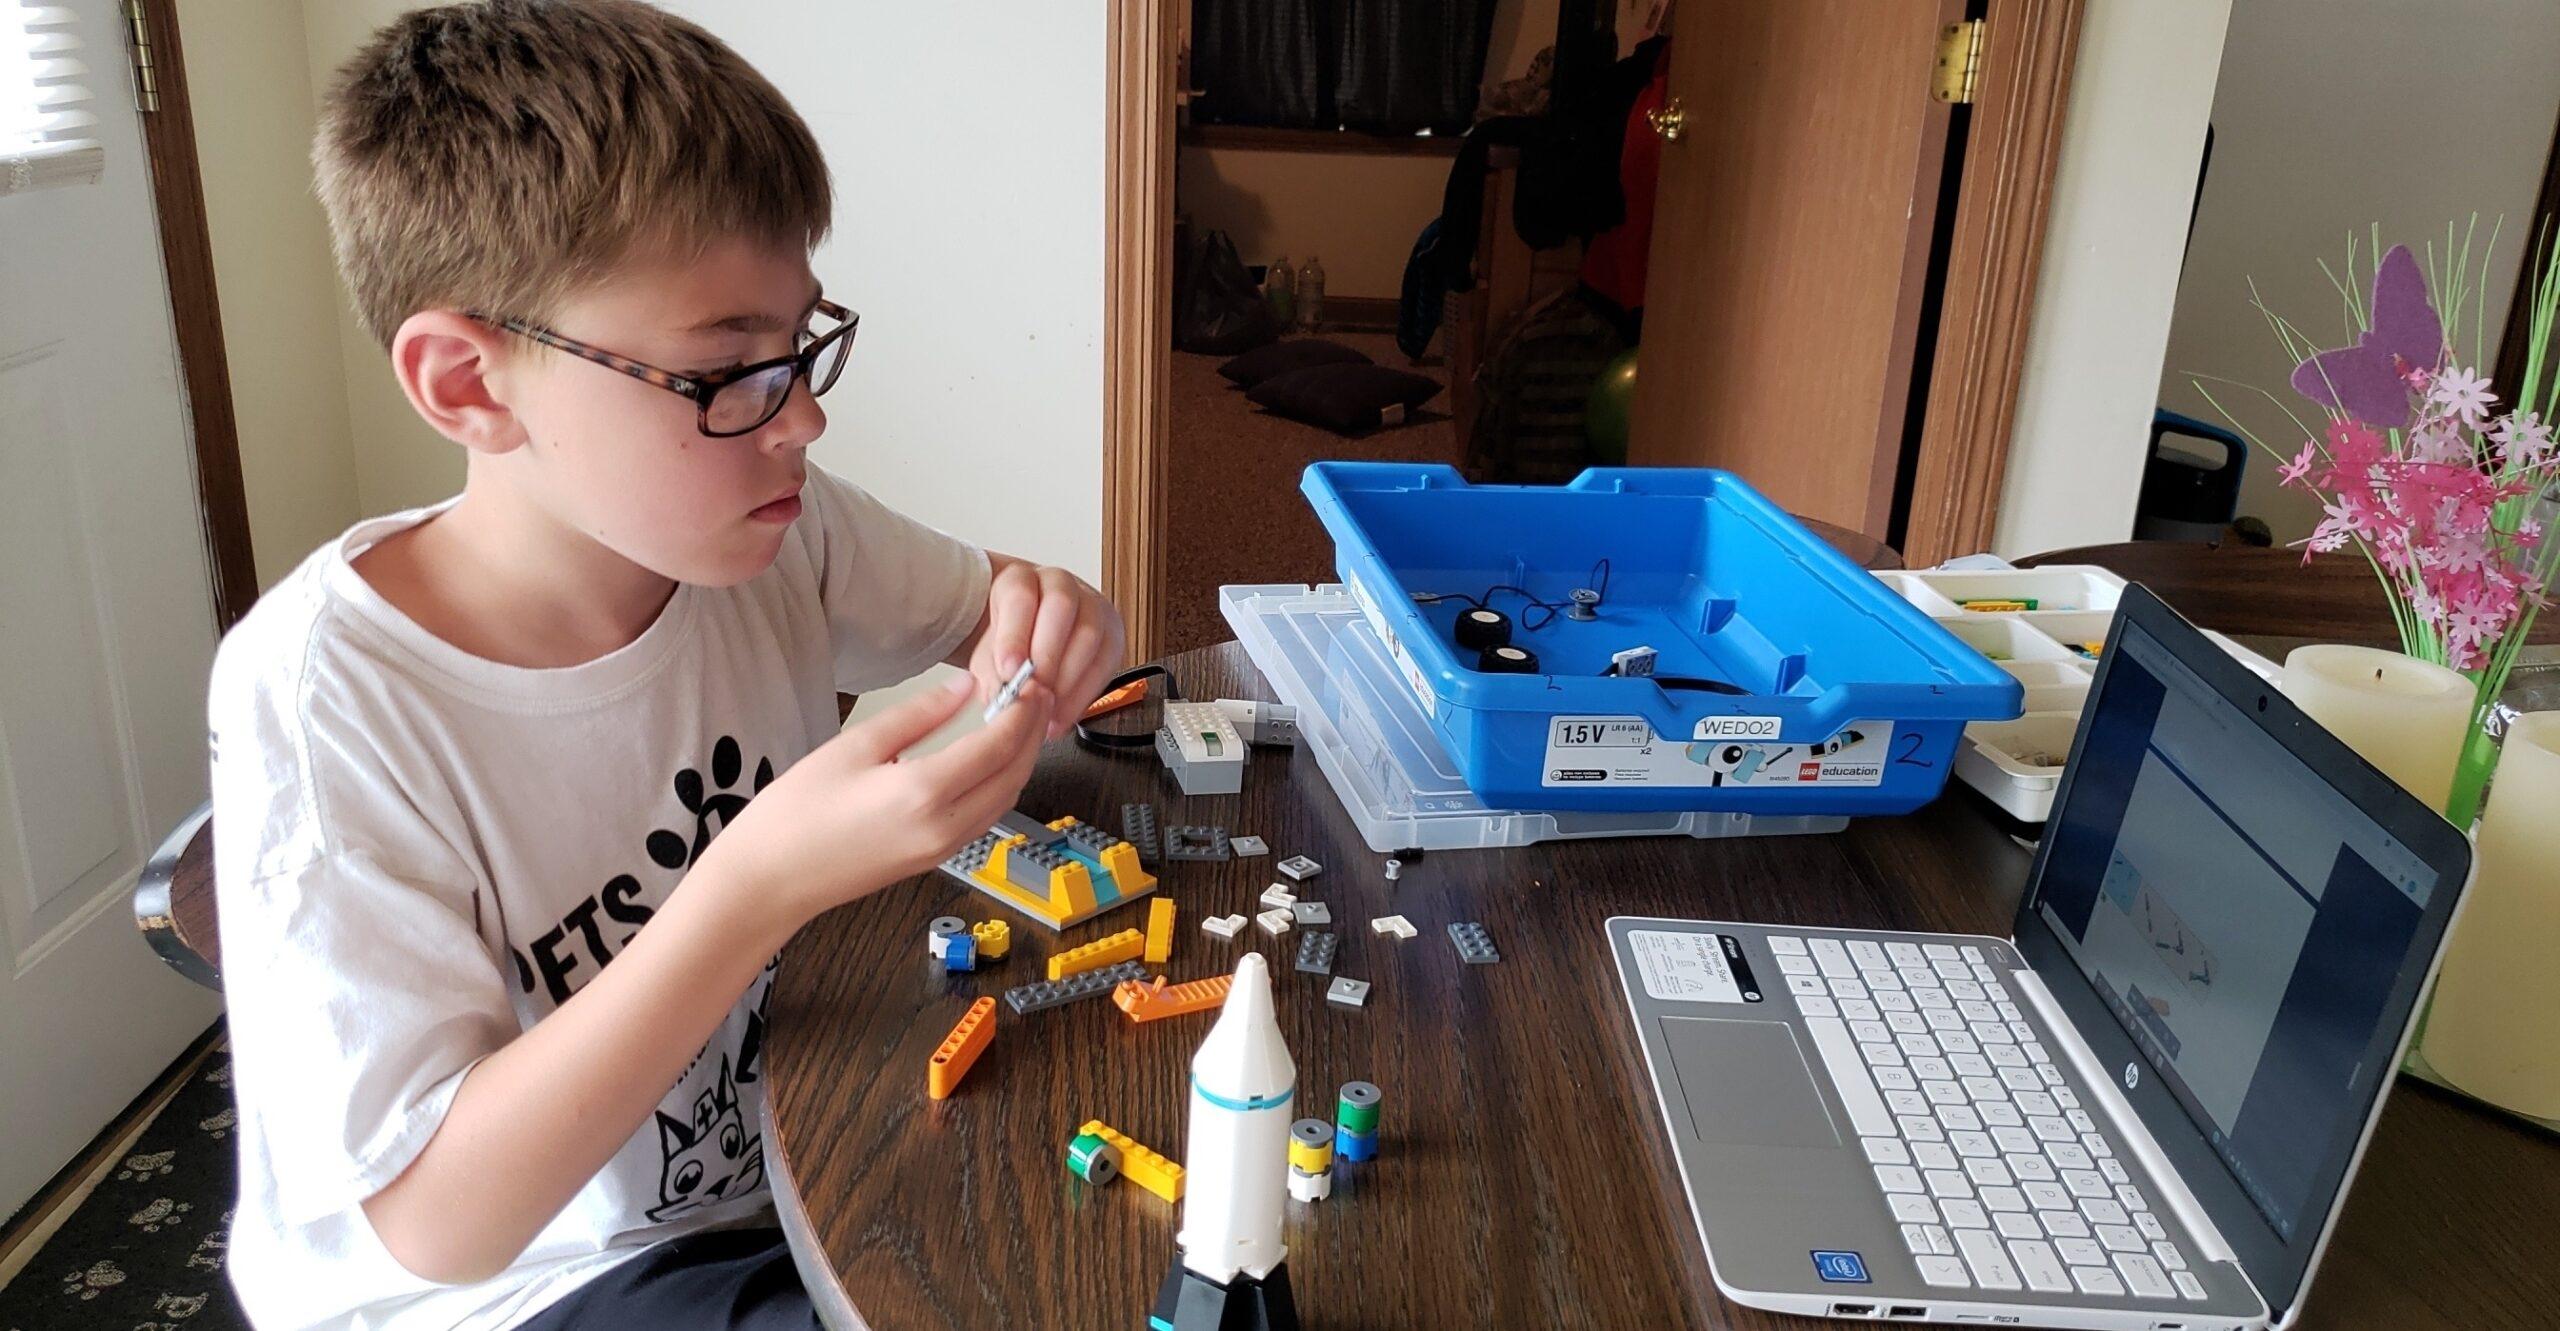 Fulton Academy camper building a LEGO Robot